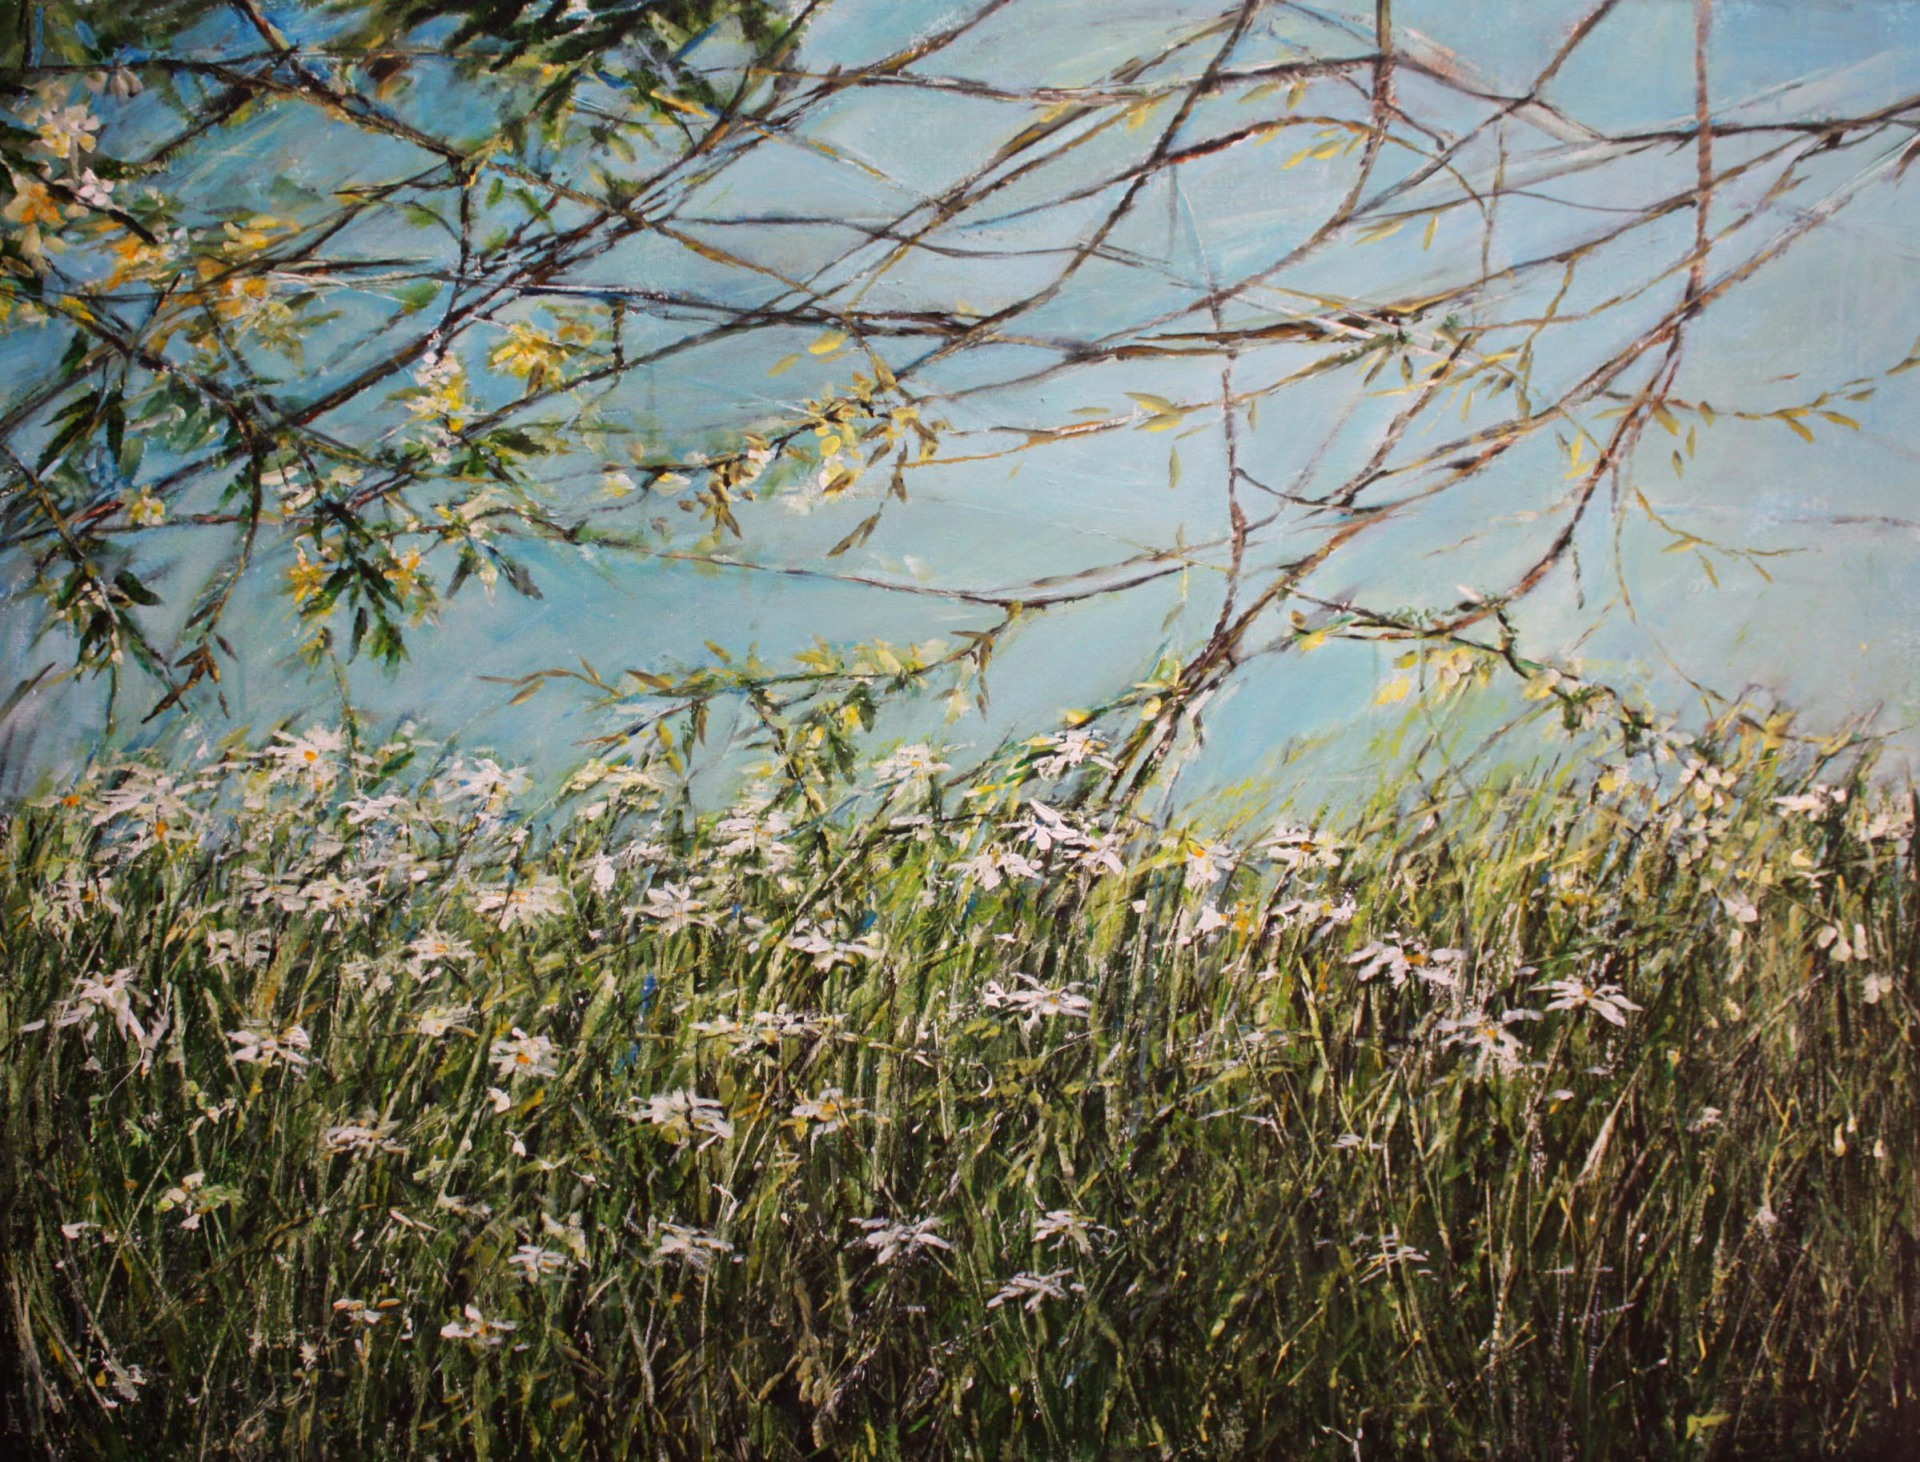 Daisies under blue sky